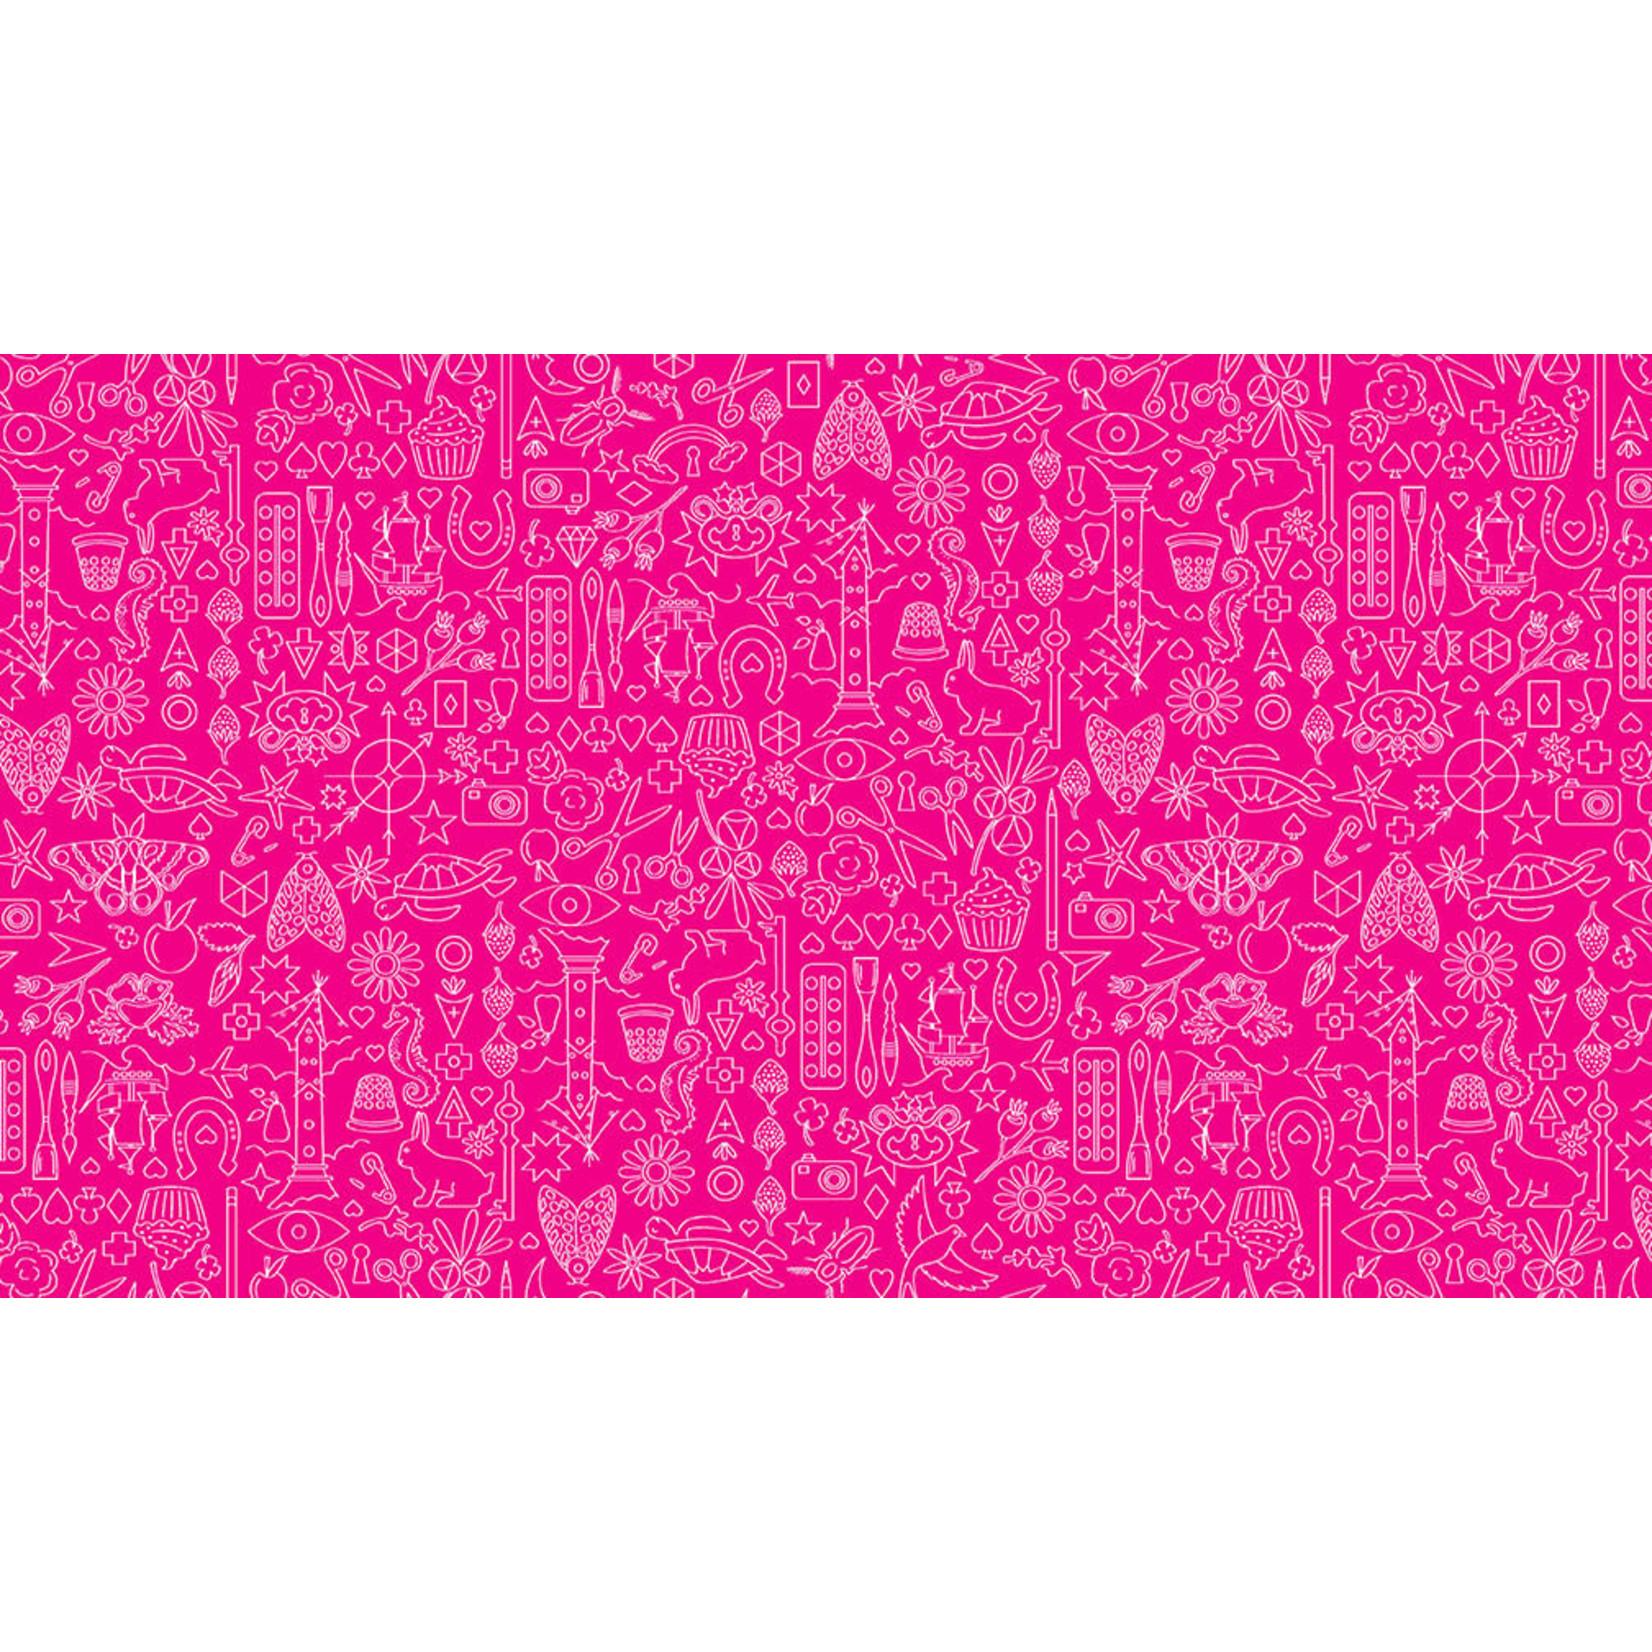 ANDOVER SUNPRINT, Strawberry Pink PER CM OR $20/M